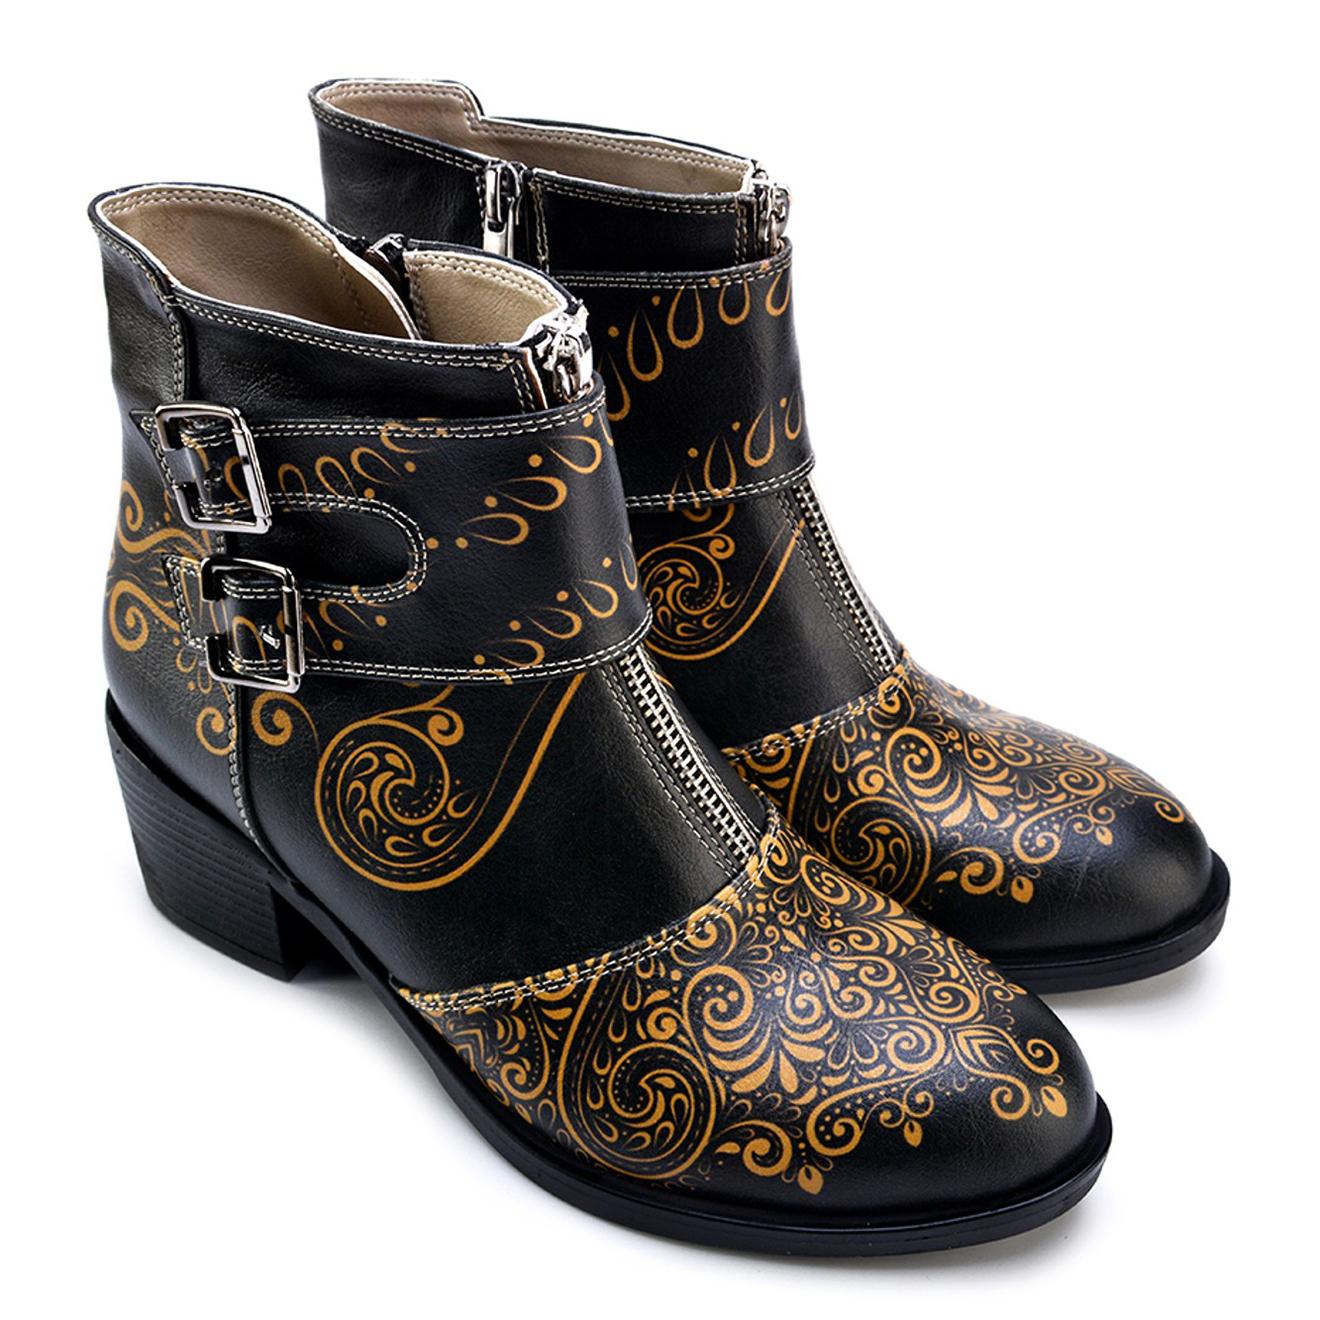 Boots Olivia noir/jaune - Talon 5 cm - Goby - Modalova